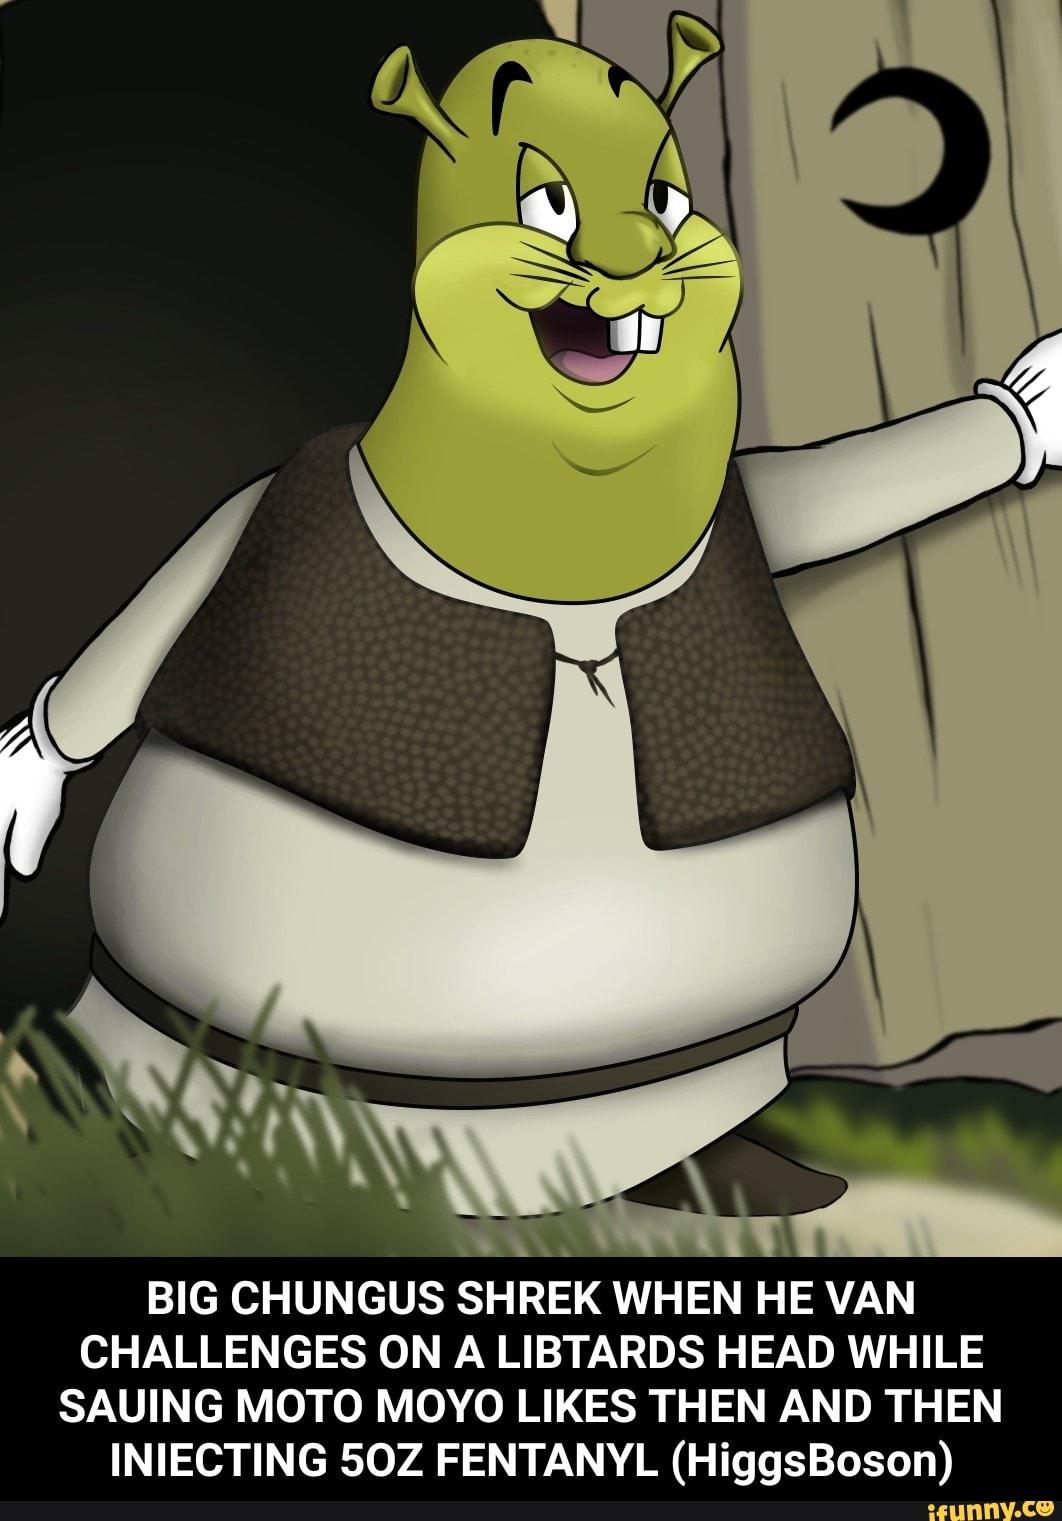 Big Chungus Shrek When He Van Challenges On A Libtards Head While